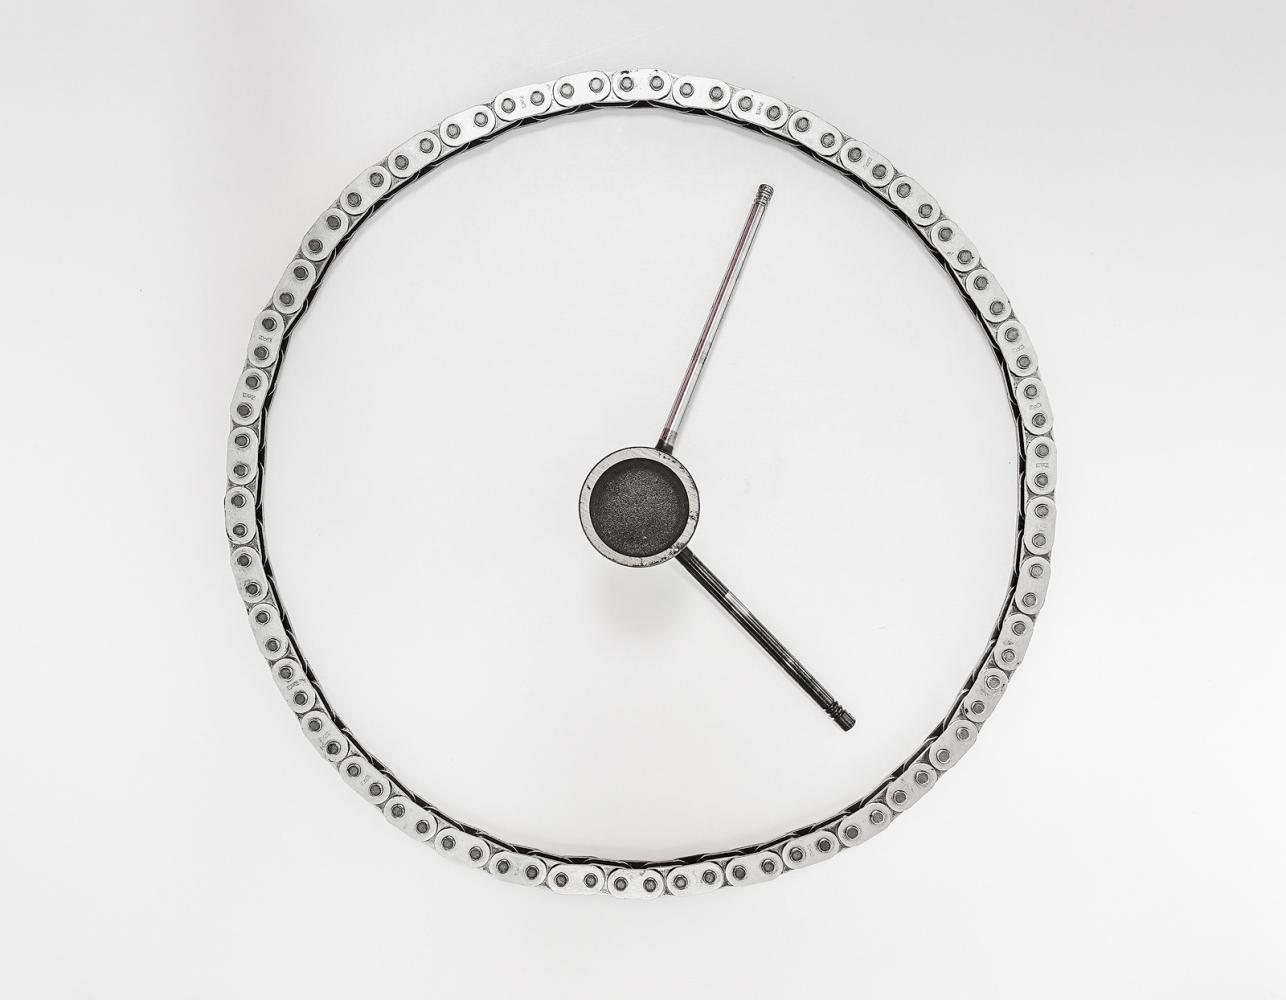 Time is running out / El tiempo se acaba Habitat II #13